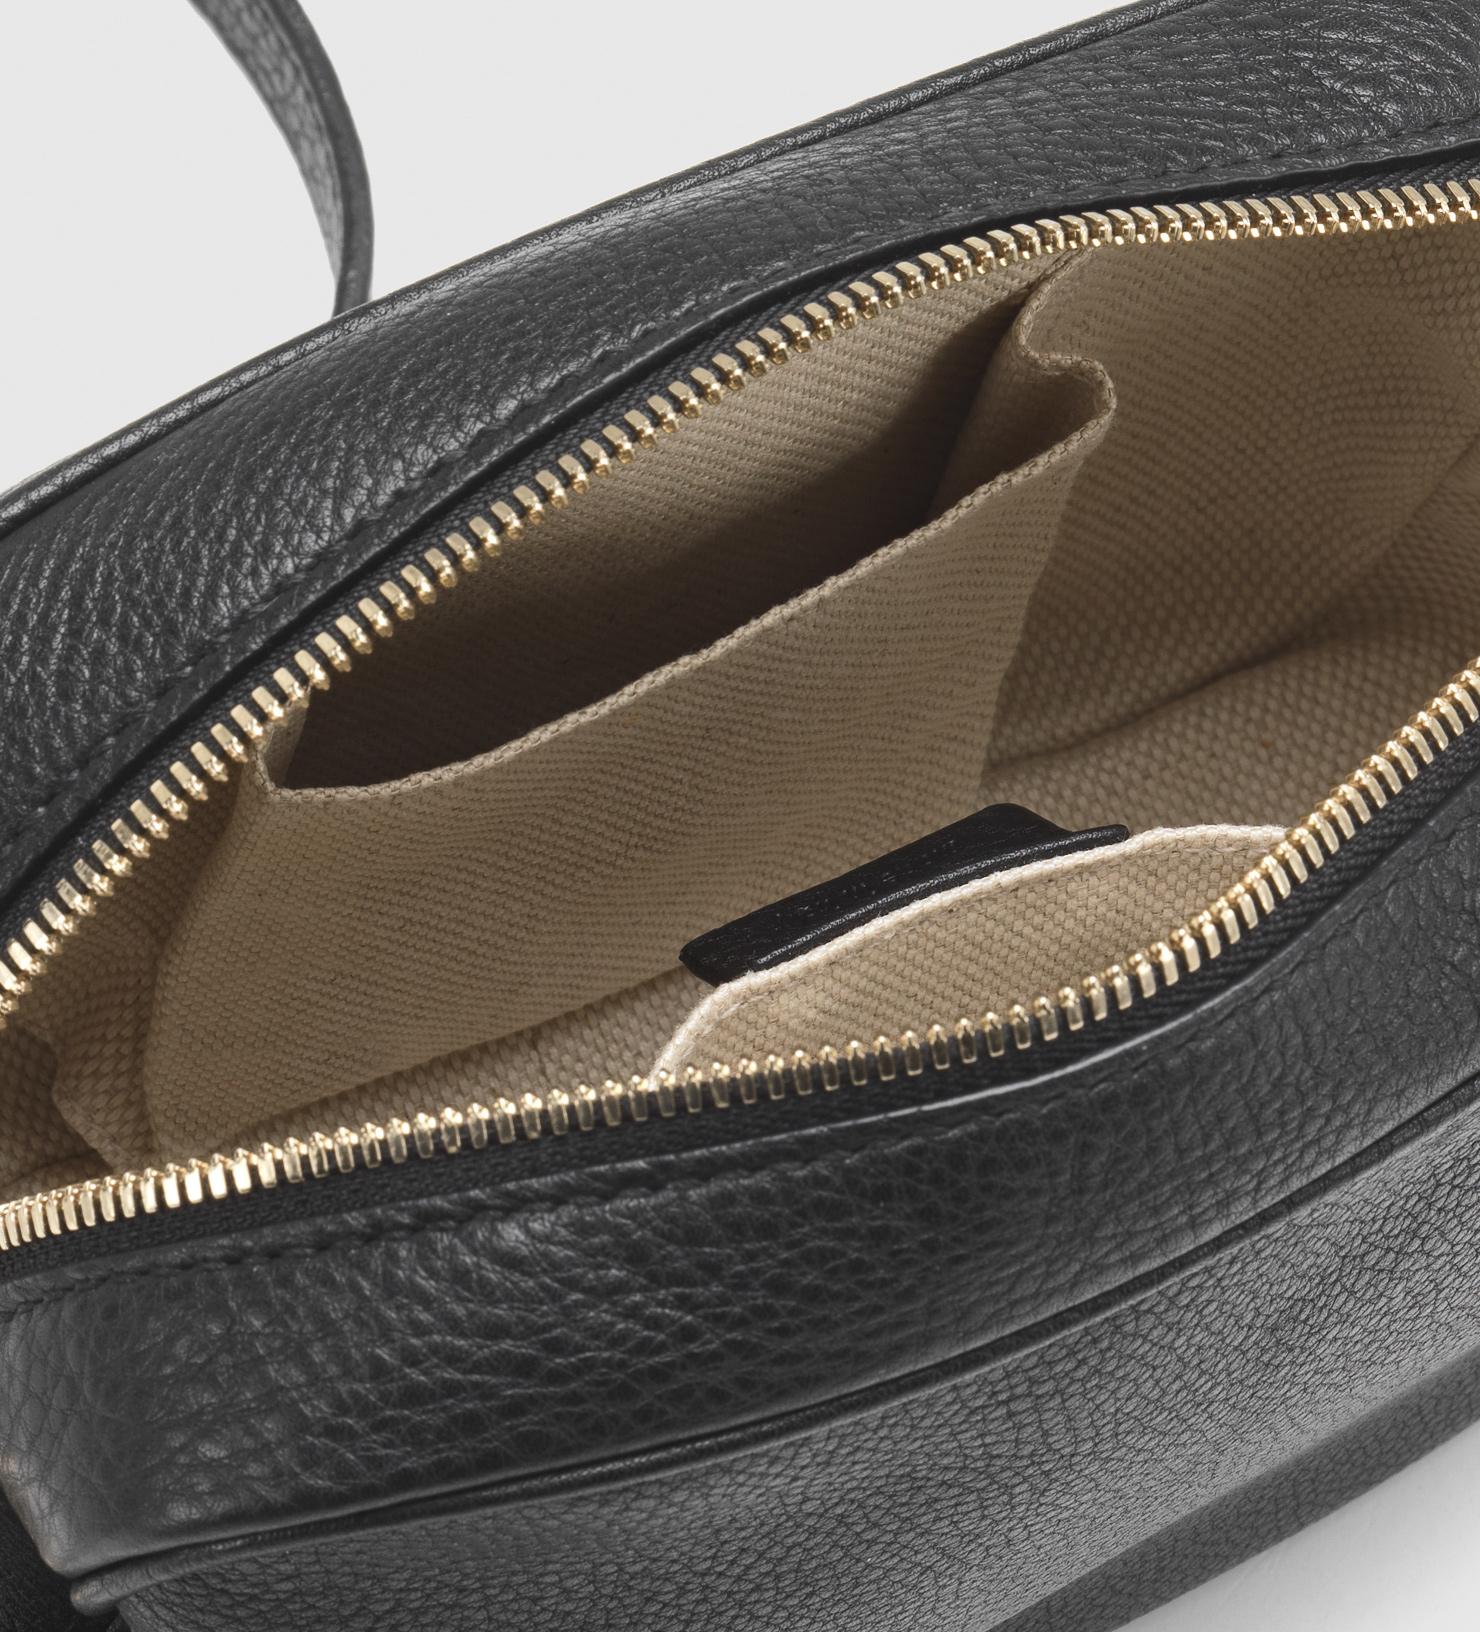 669a7b69e09 Lyst - Gucci Soho Leather Disco Bag in Black